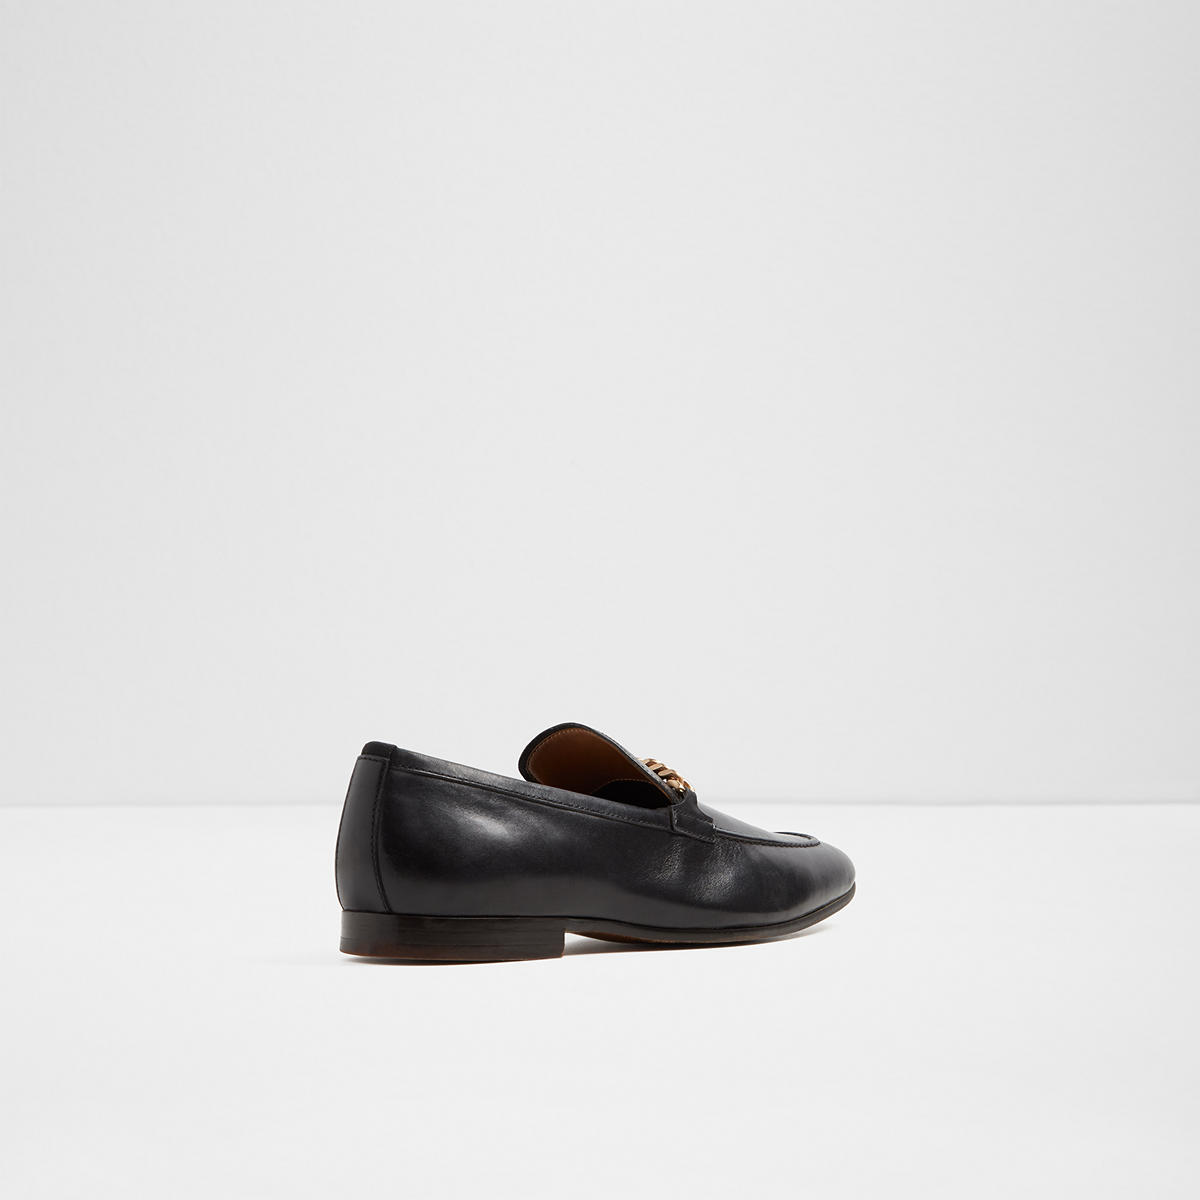 45ac6e86358 Royton Black Men s Dress shoes